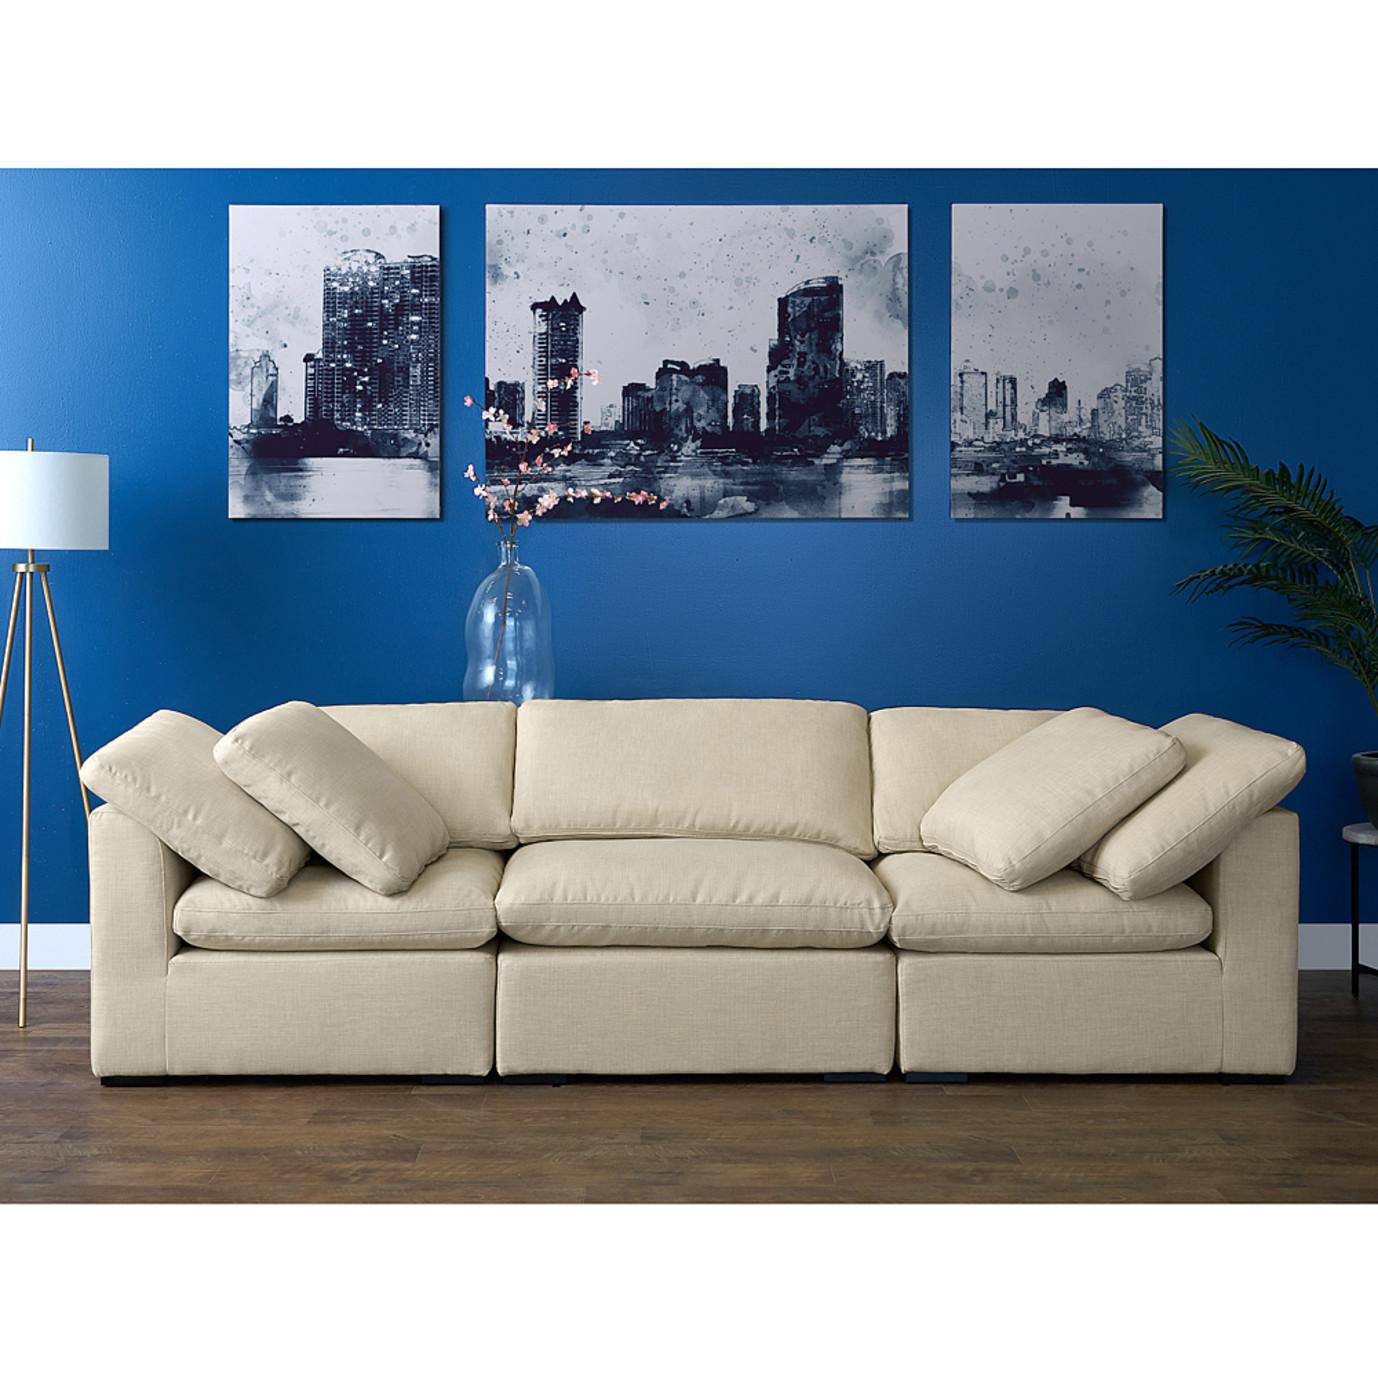 Aria 3 Piece Sofa Set - Beige